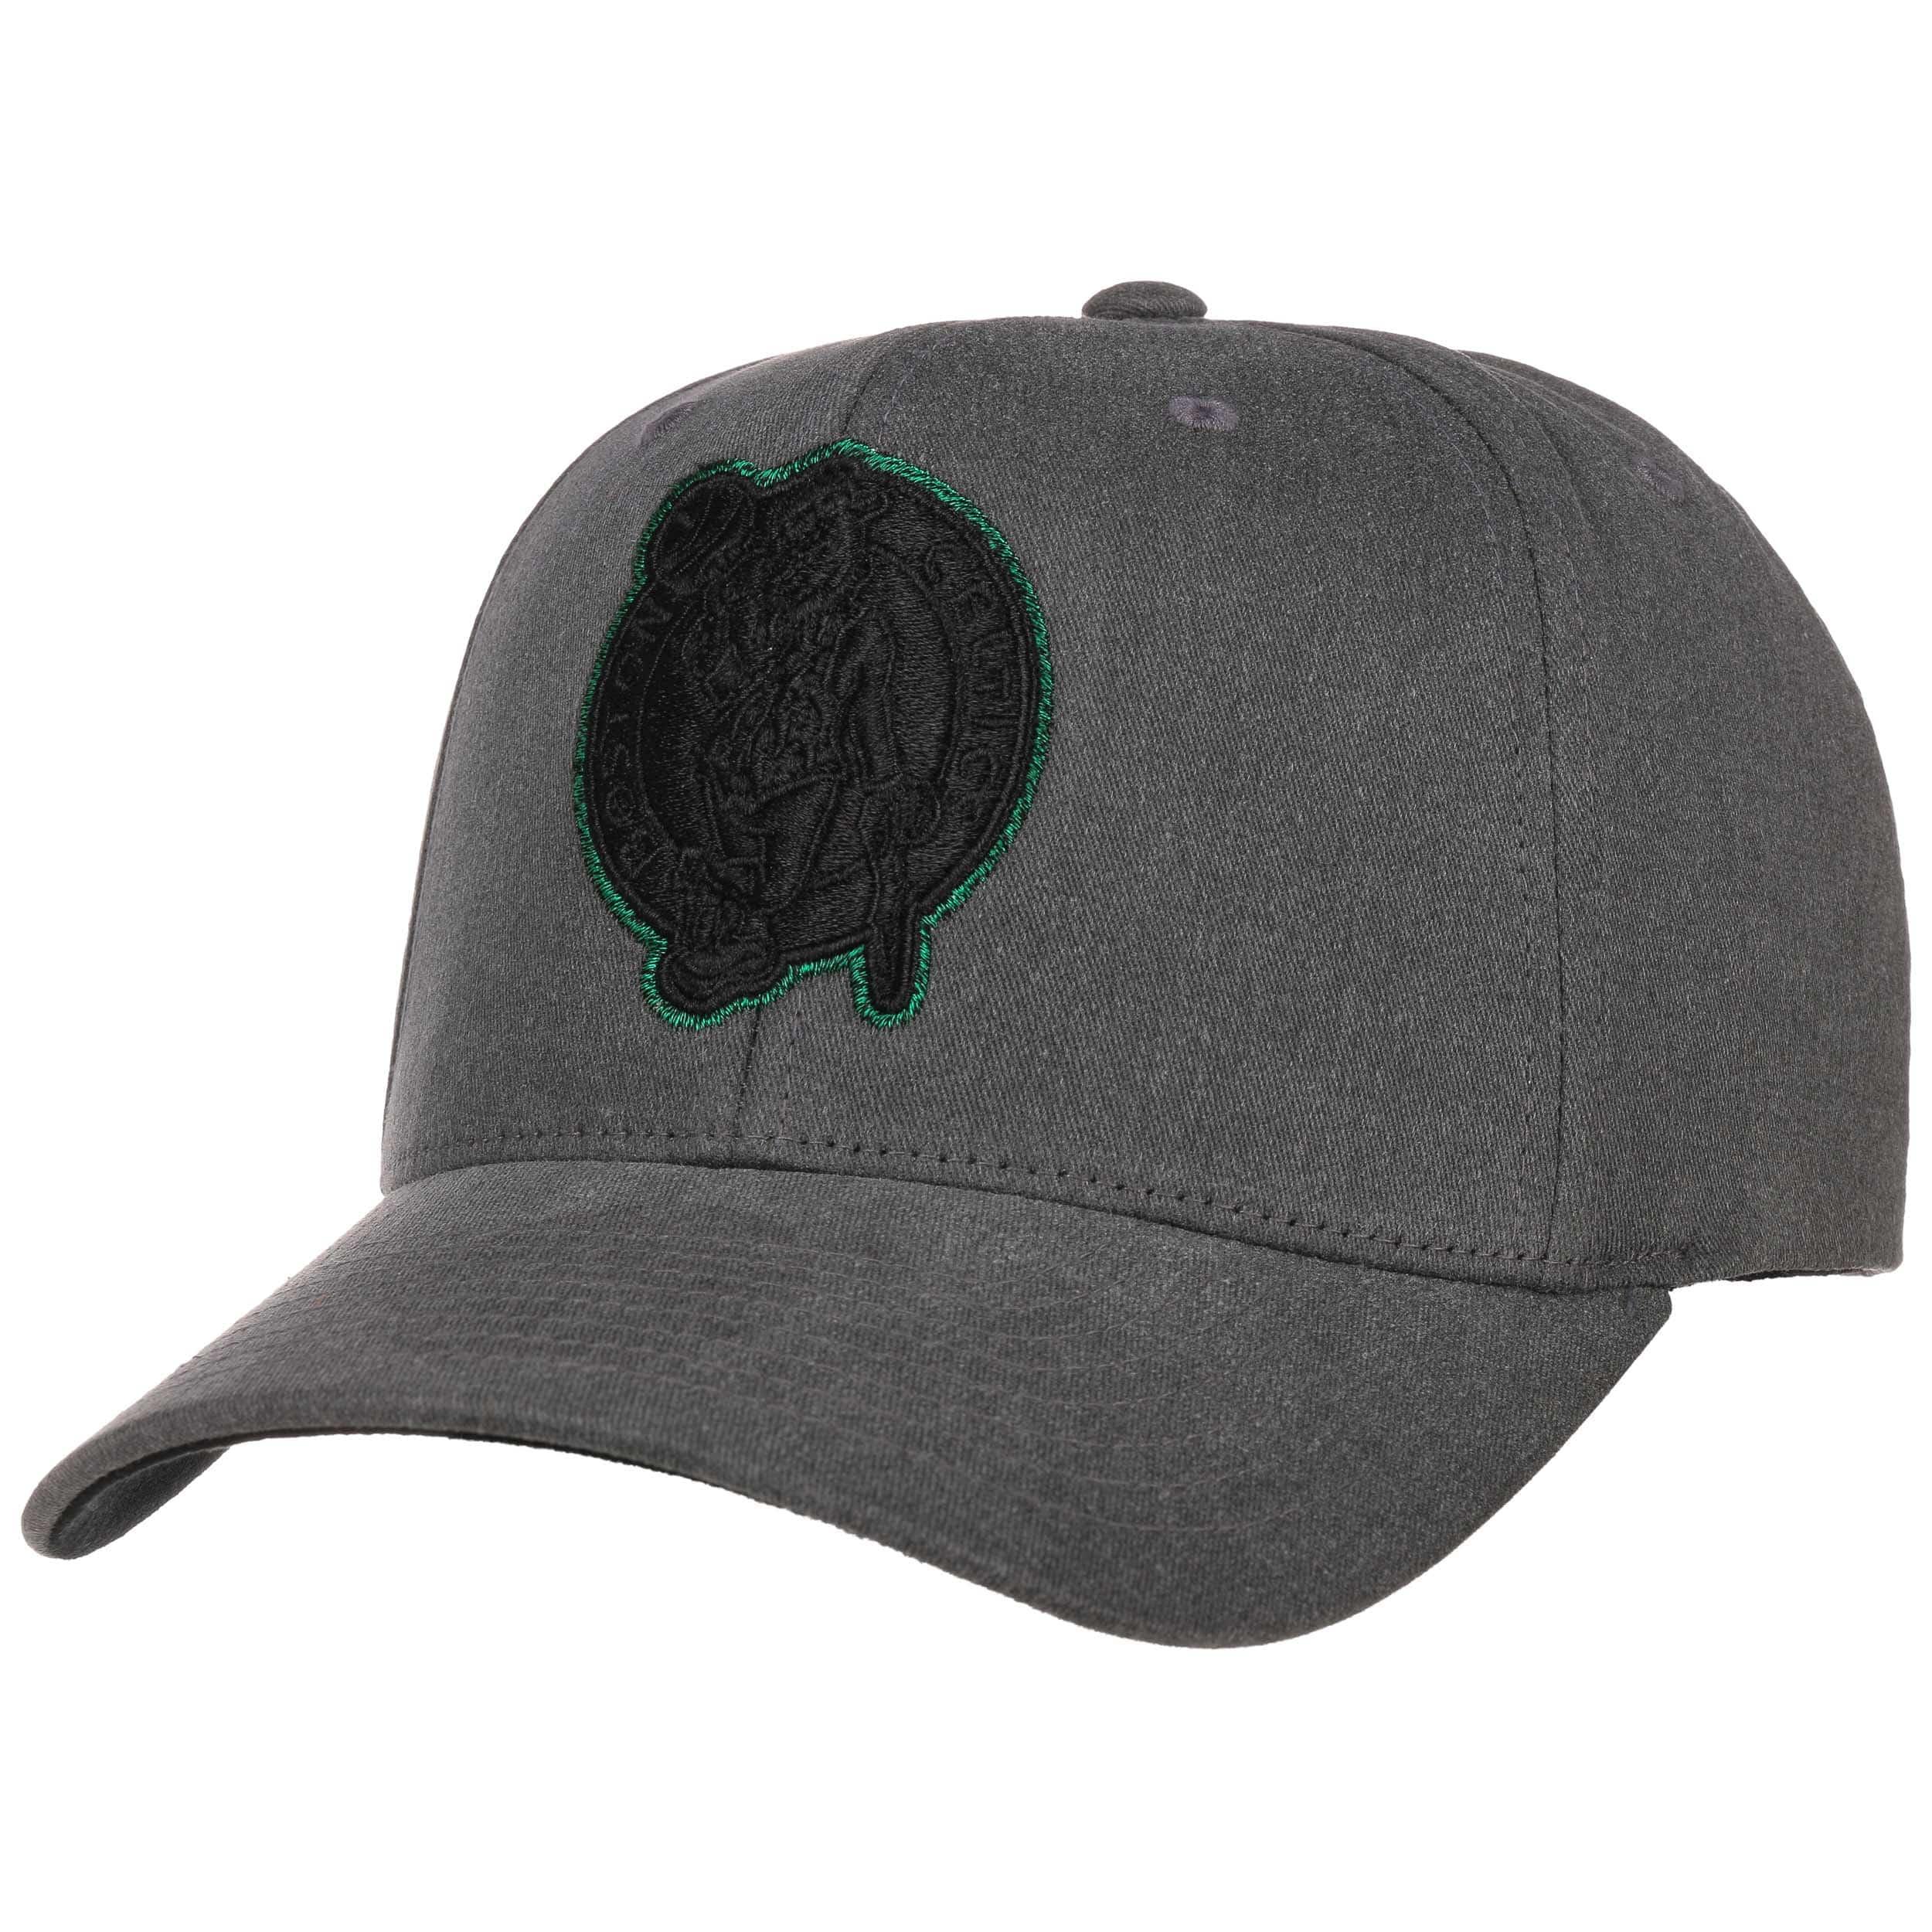 NBA Washed 110 Celtics Cap. by Mitchell   Ness b925de3a131